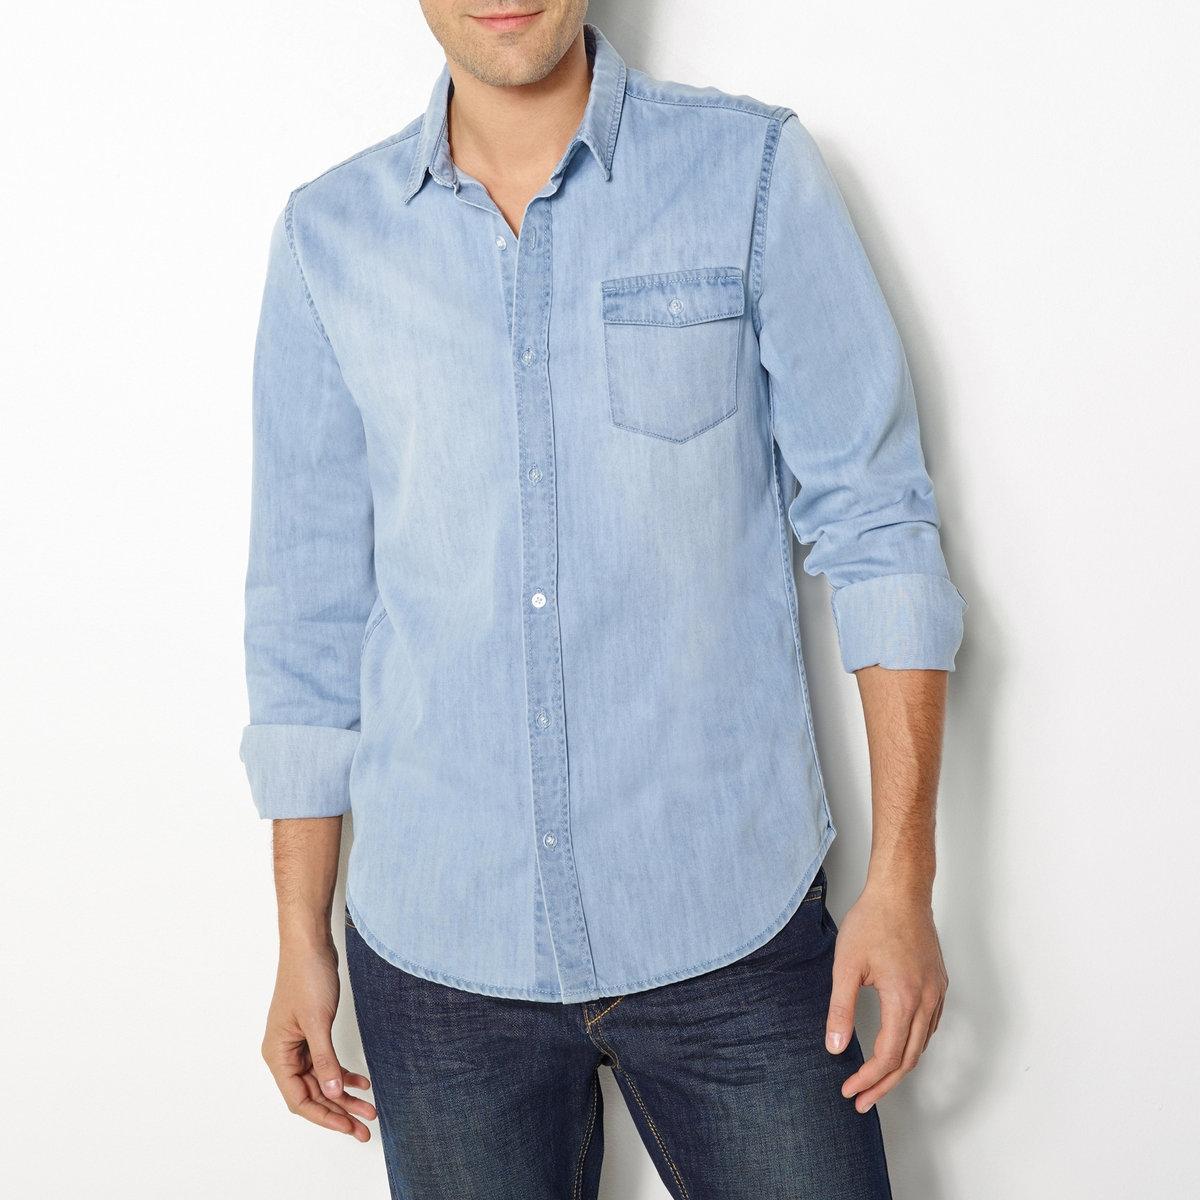 Рубашка узкая из денима, 100% хлопка от La Redoute